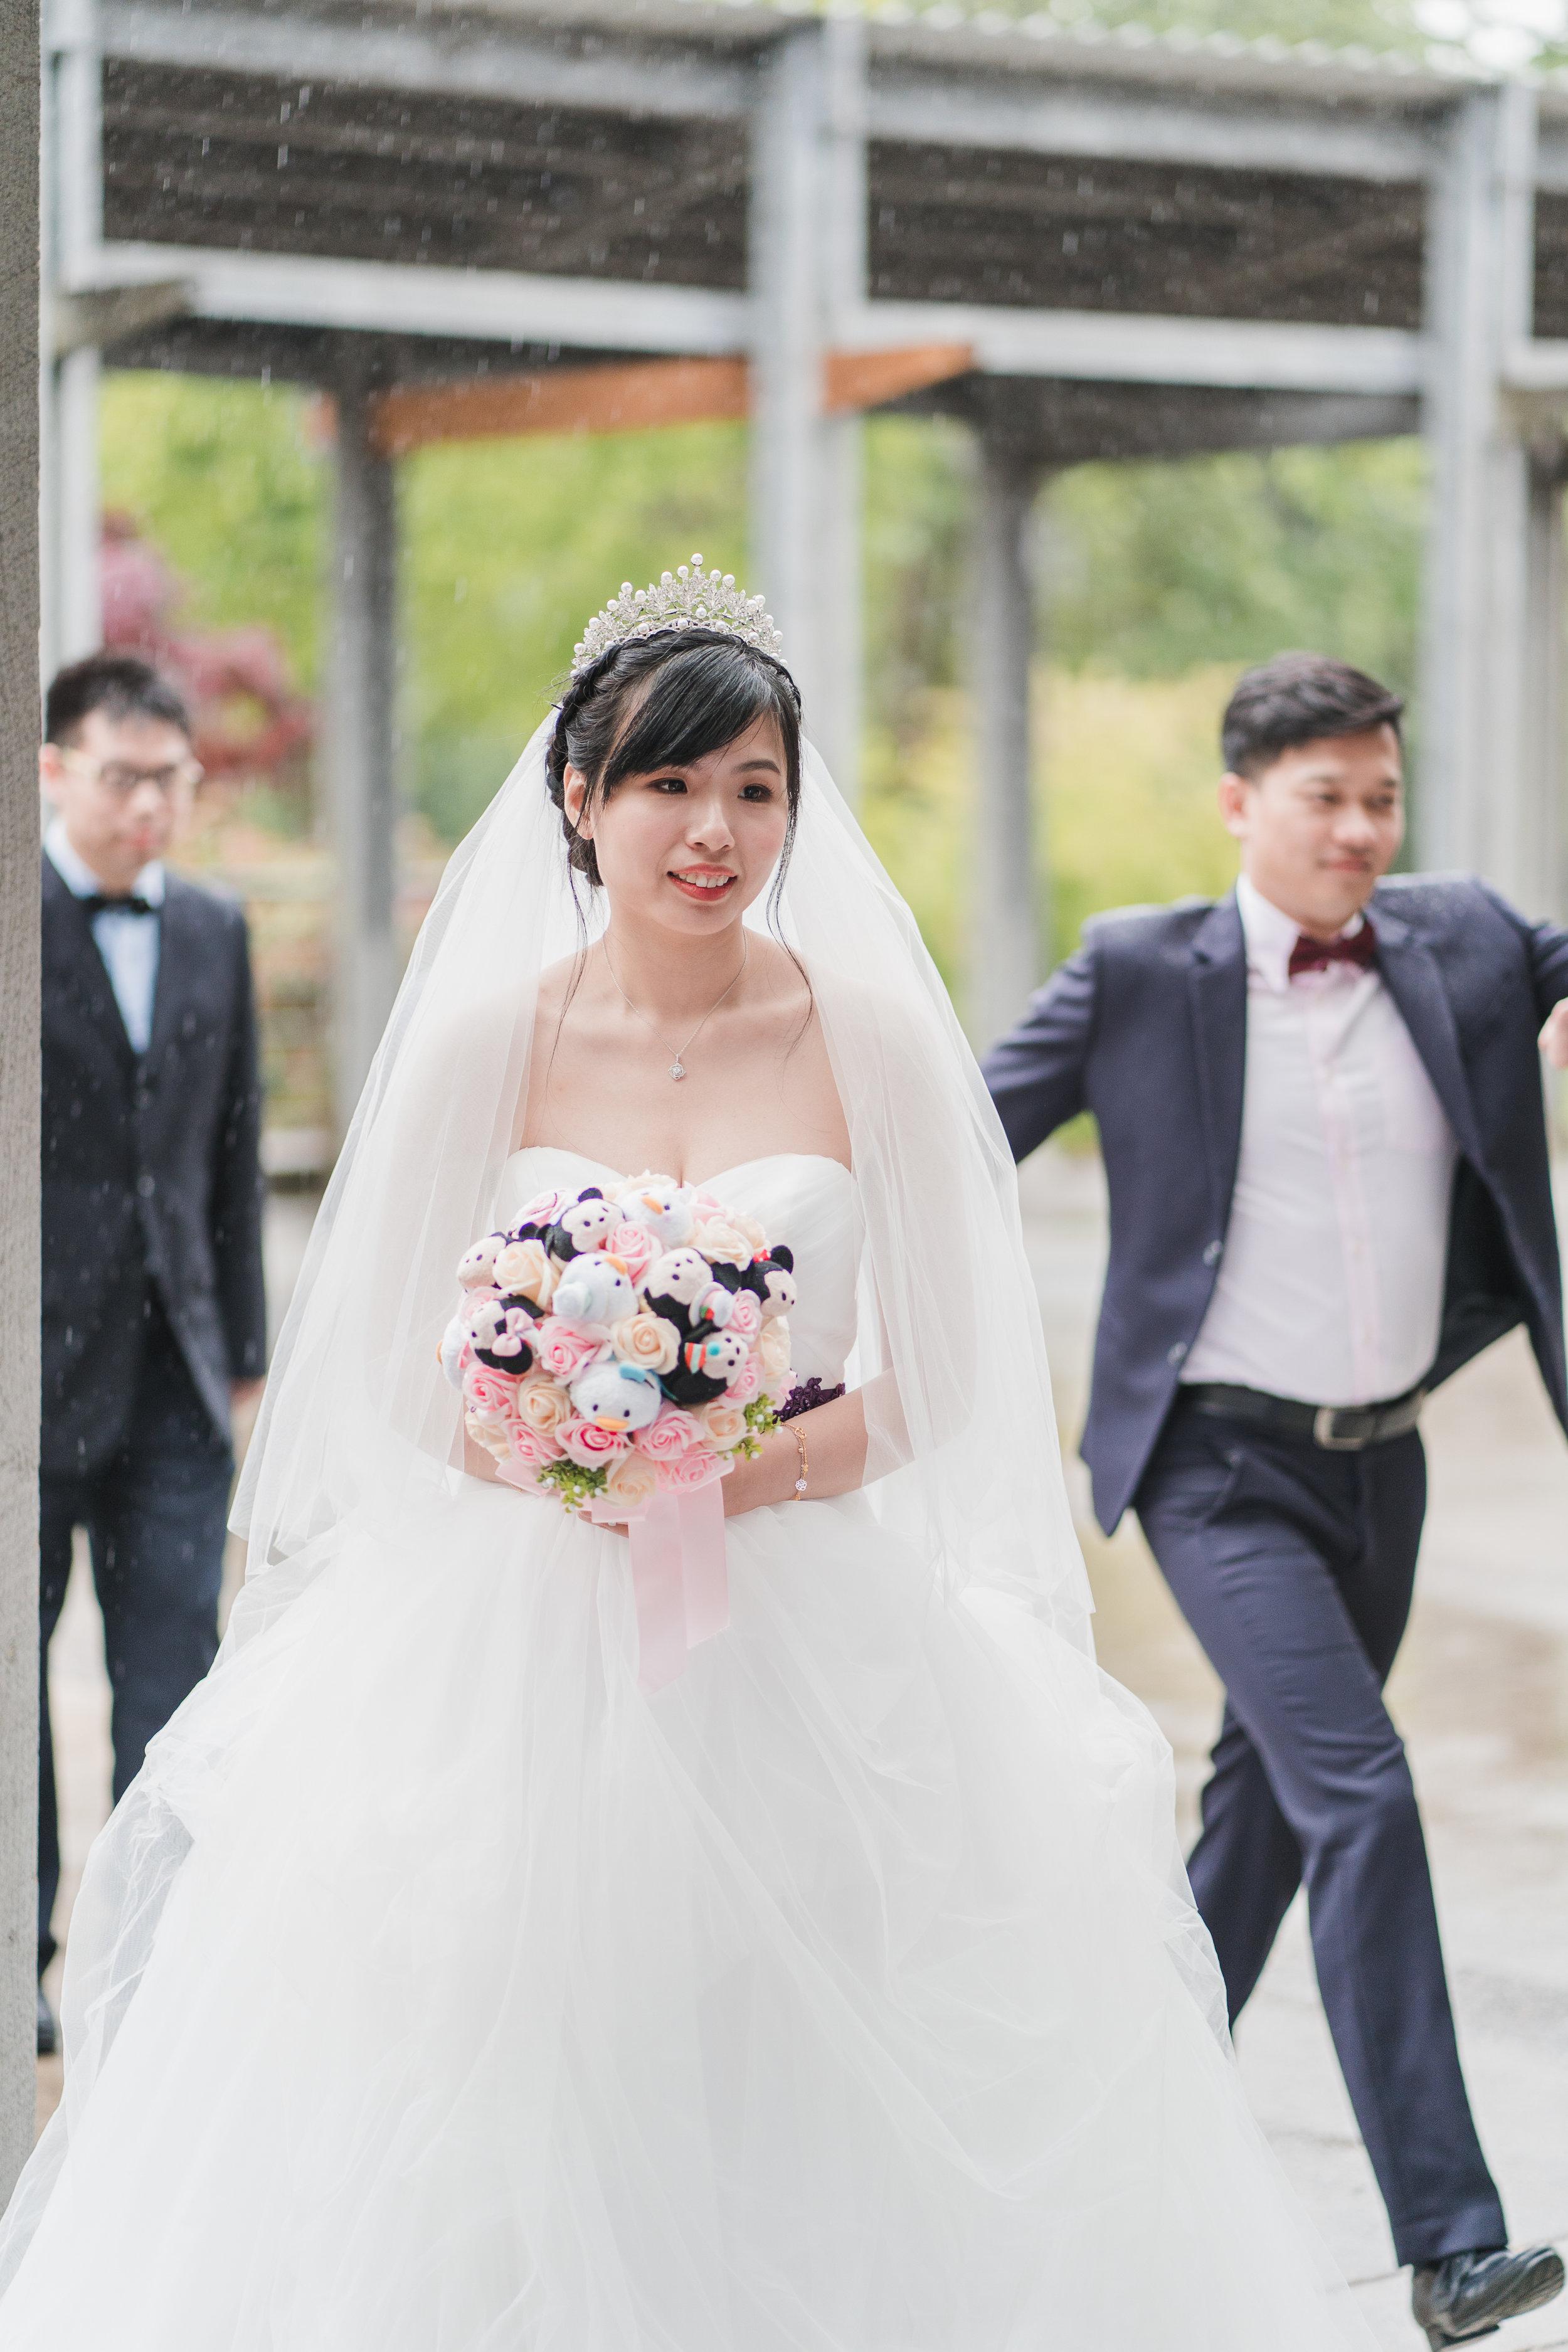 20190520 - Pamela & Matthew Wedding - 0204.jpg